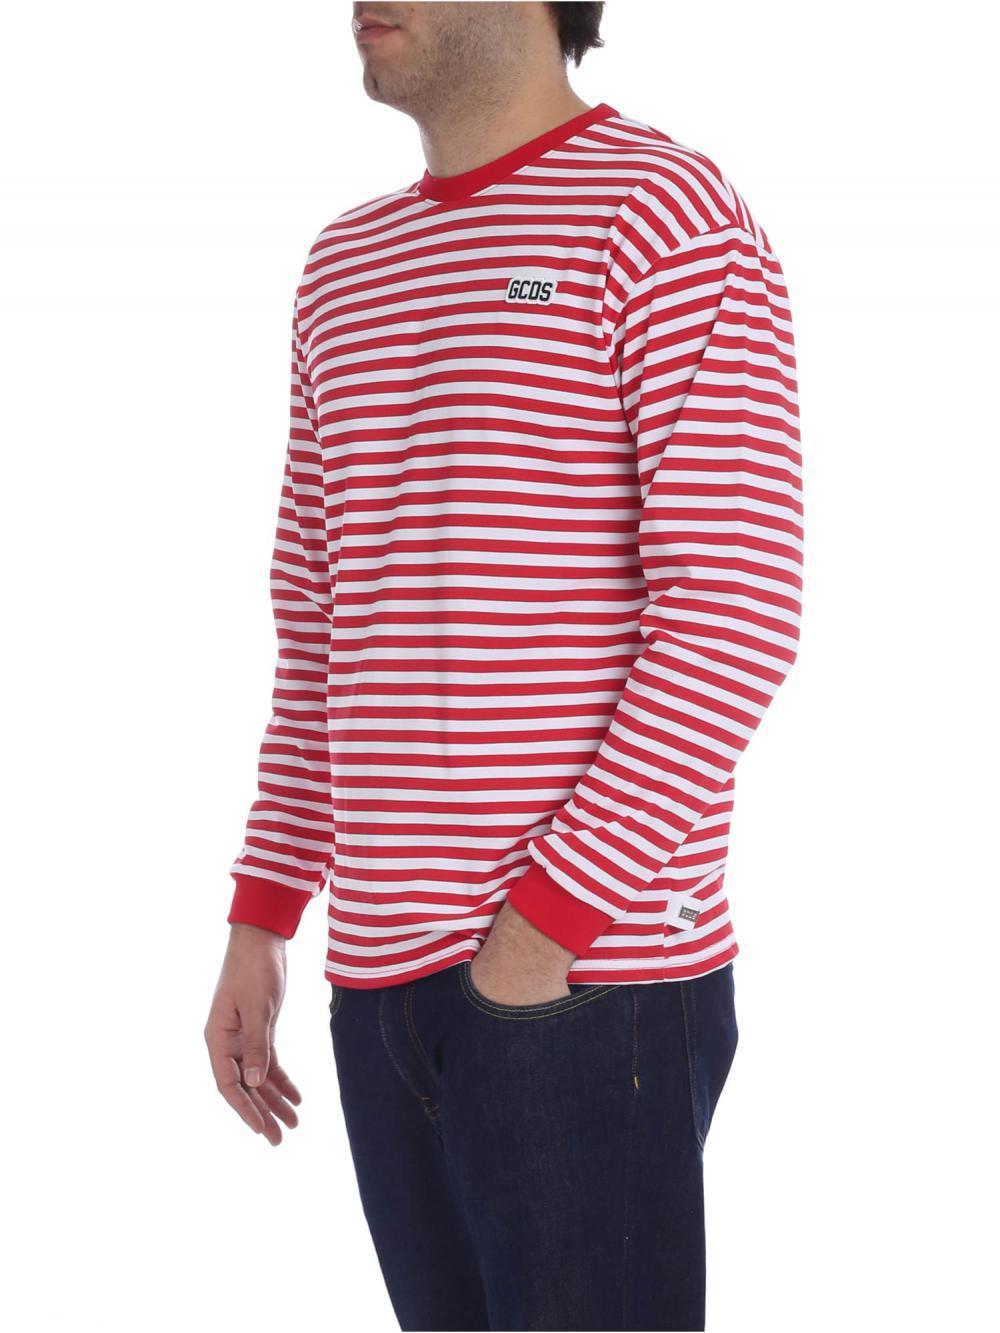 t-shirt-gcds-cod-cc94m020090